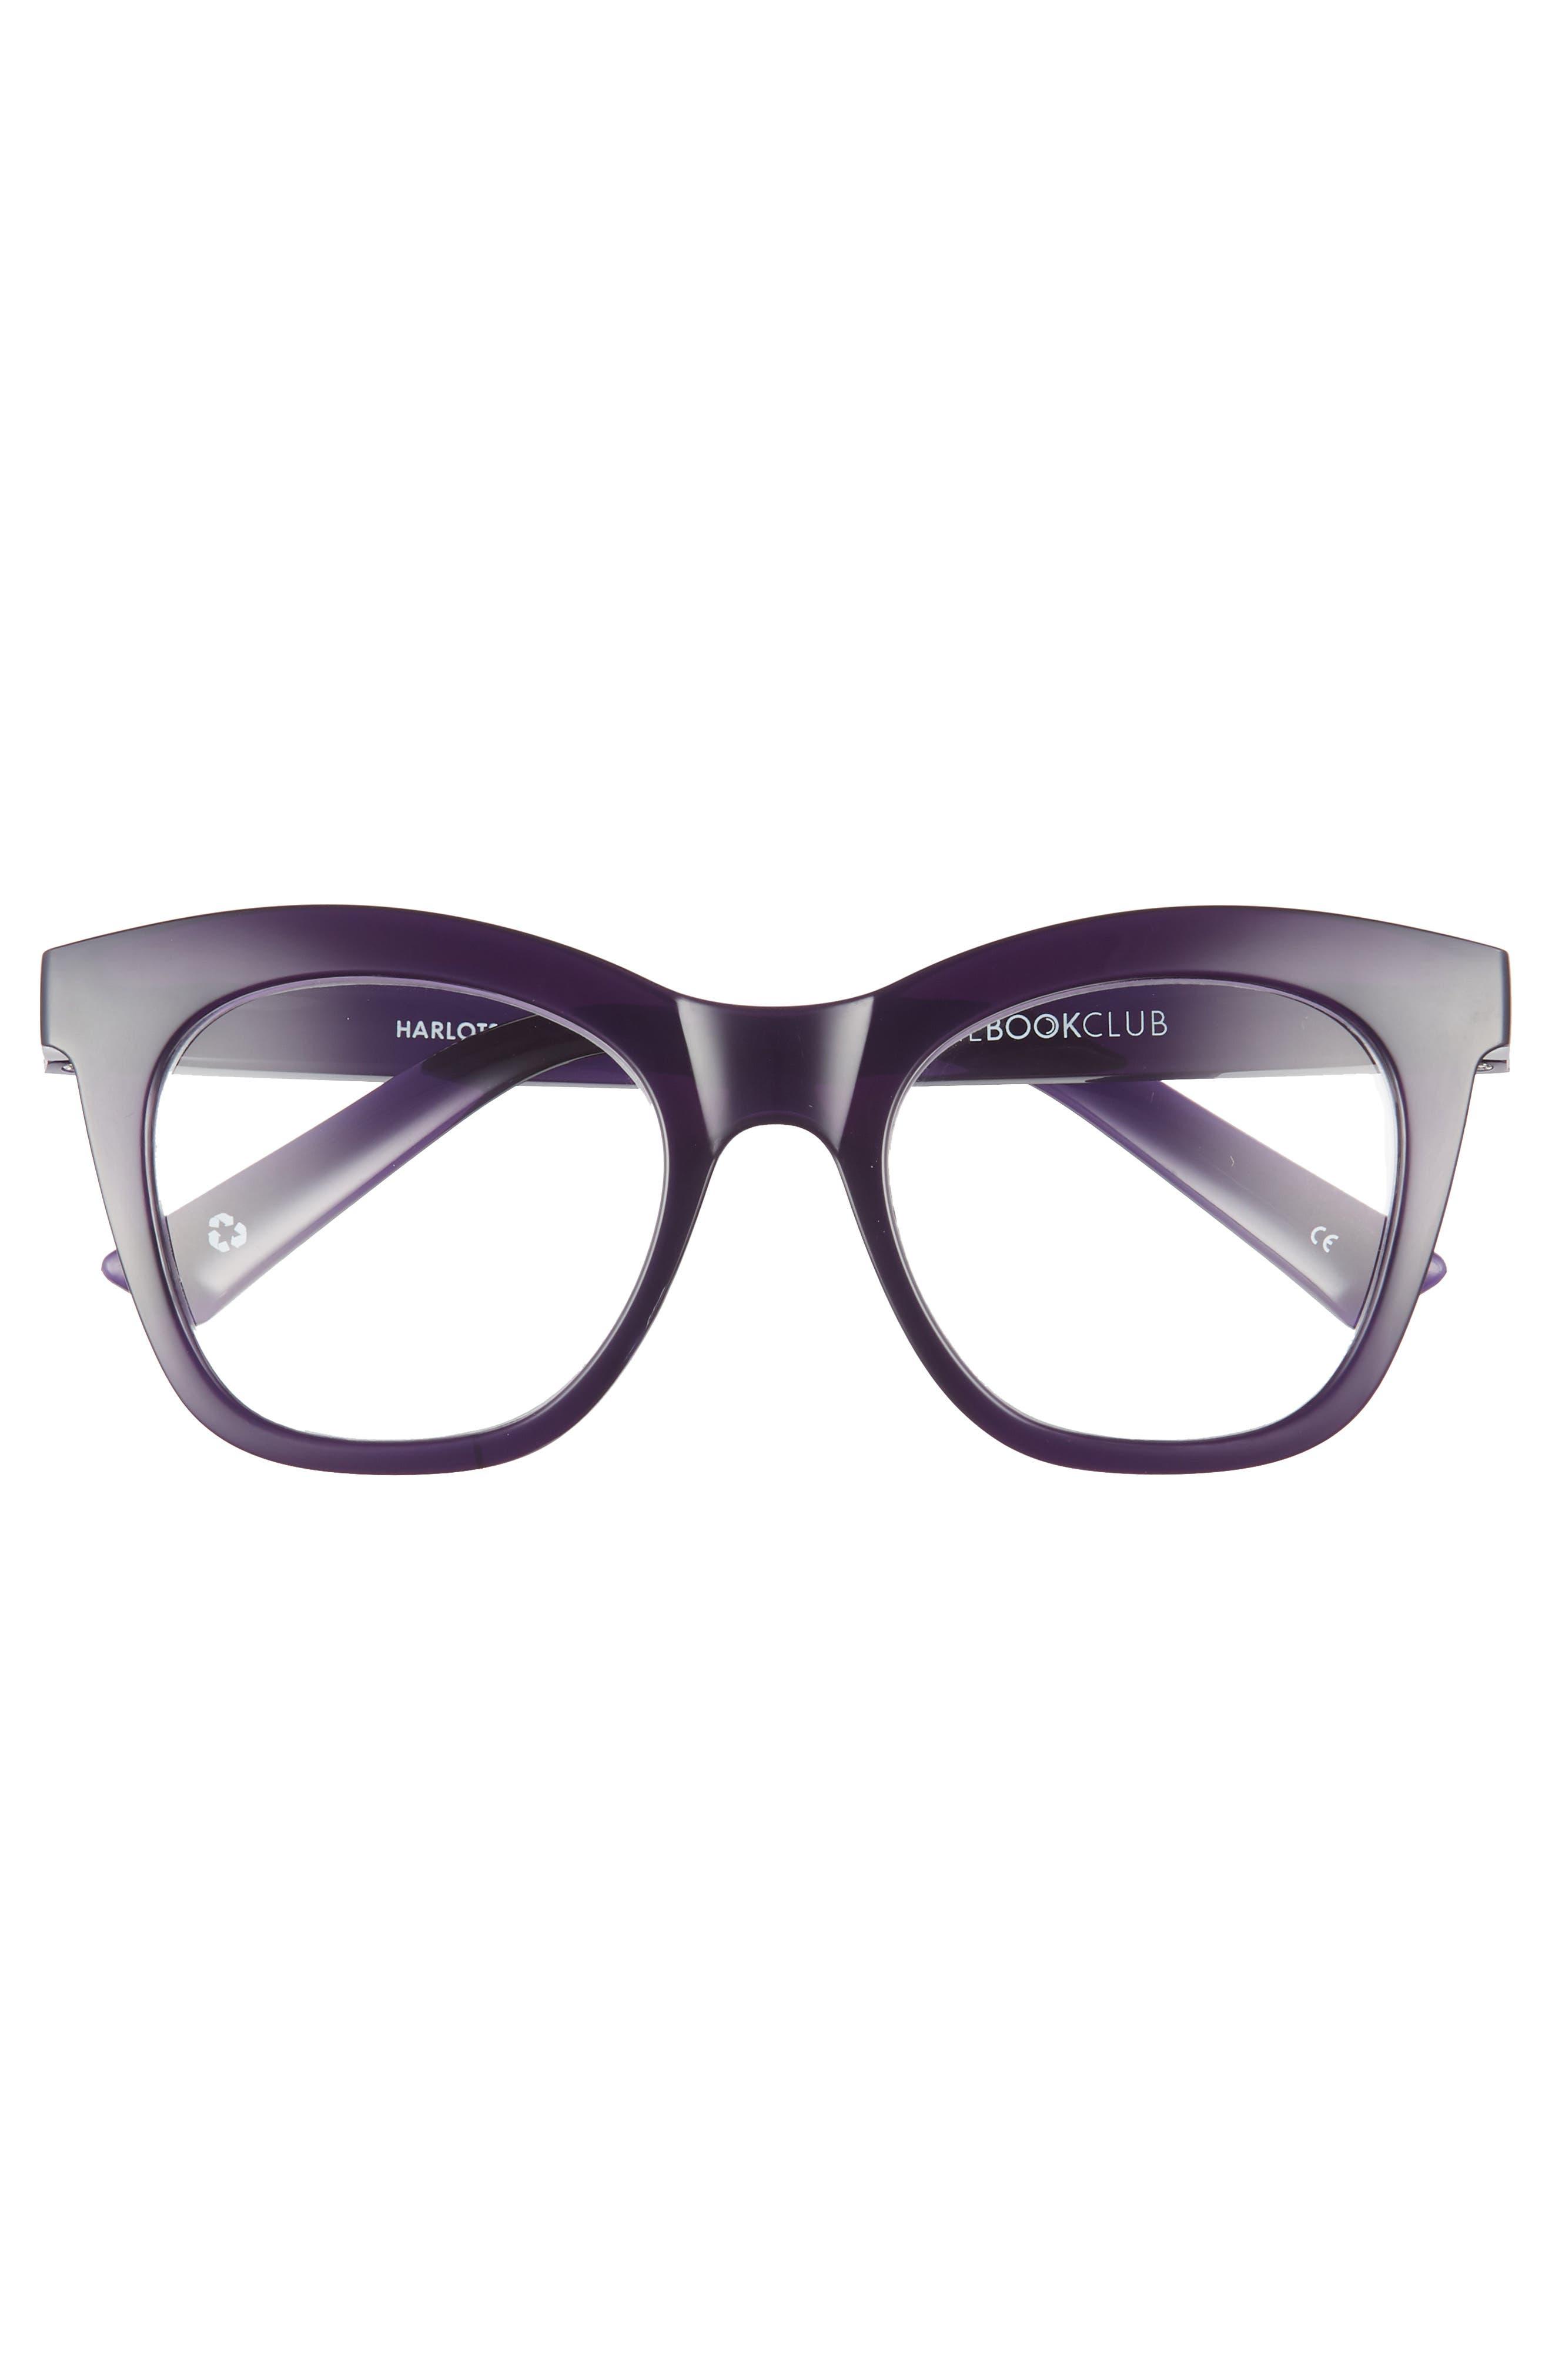 Harlot's Bed 51mm Reading Glasses,                             Alternate thumbnail 3, color,                             Deep Purple